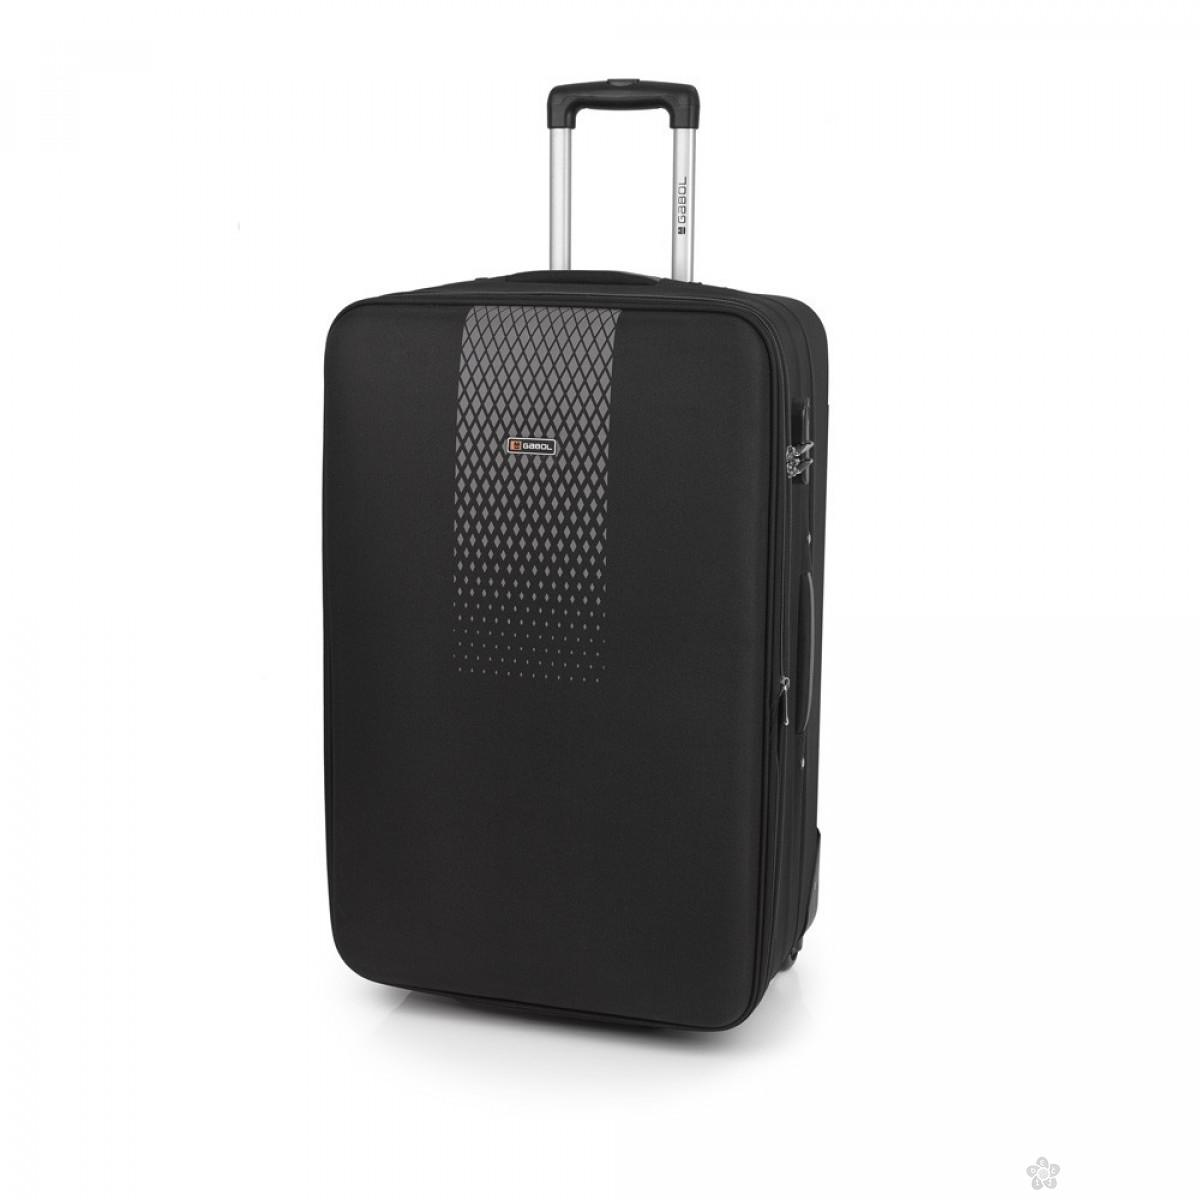 Kofer veliki polyester Roll crna, 16KG114547B